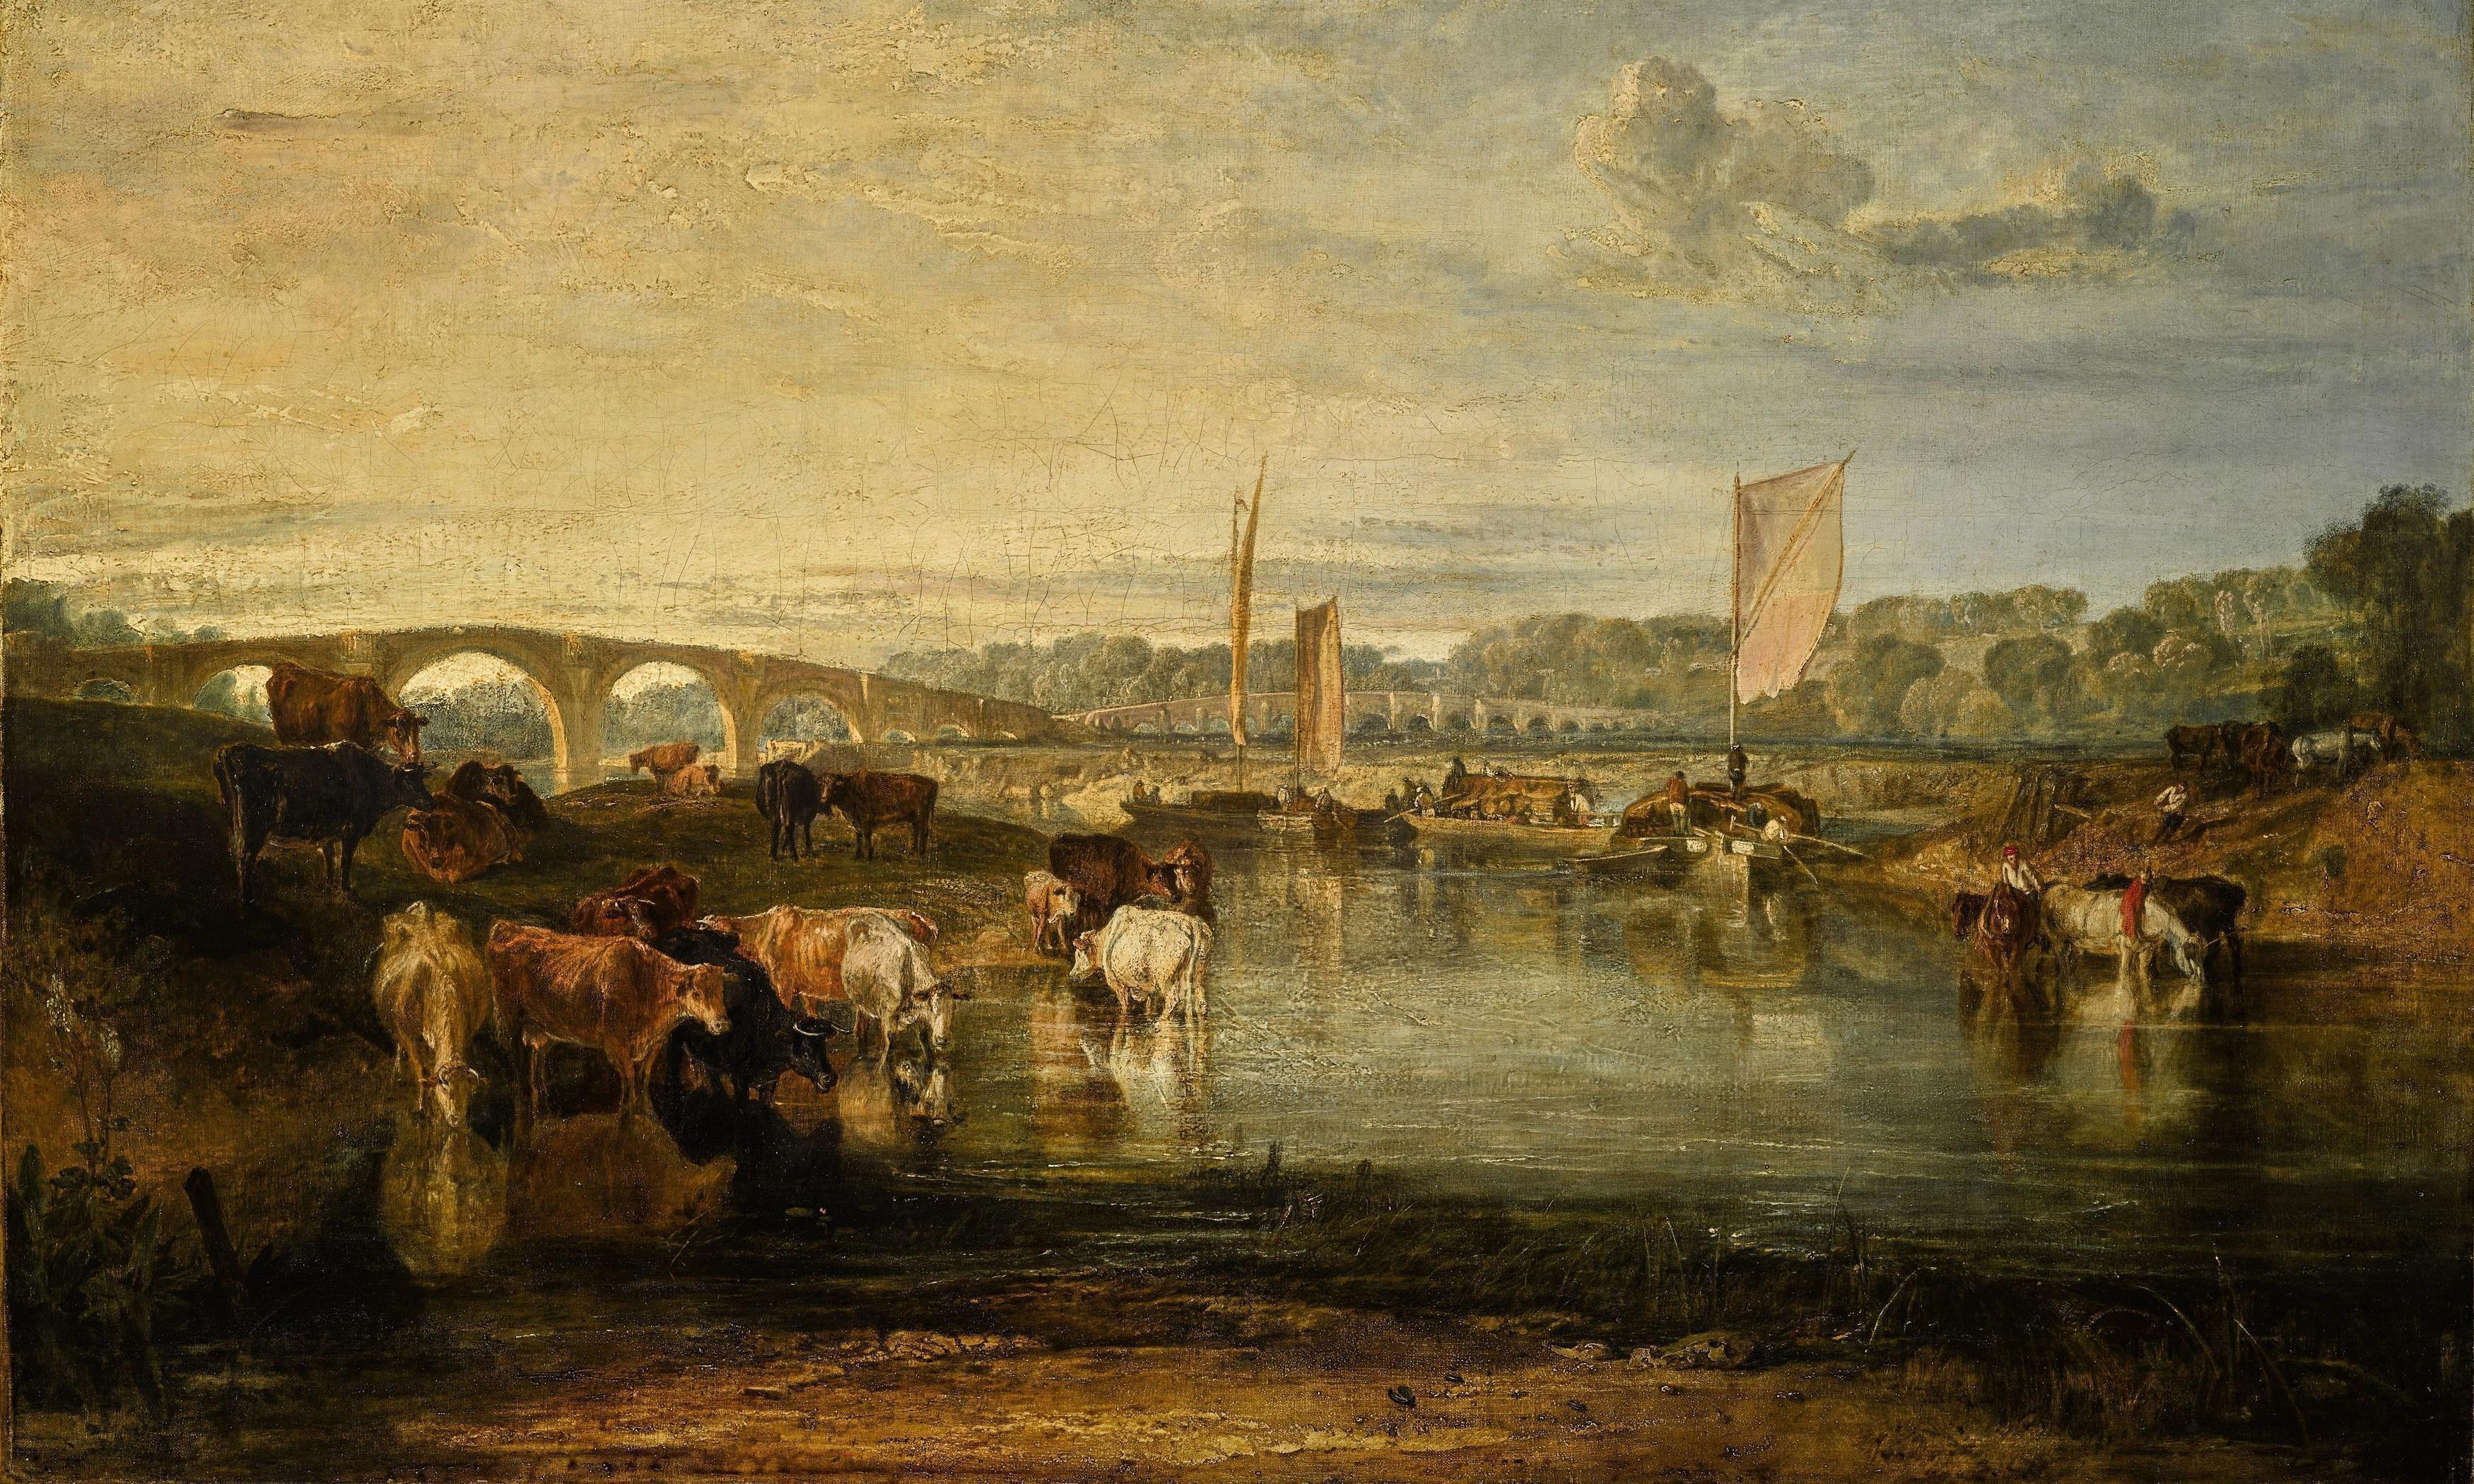 Minister blocks export of £3.4m JMW Turner painting